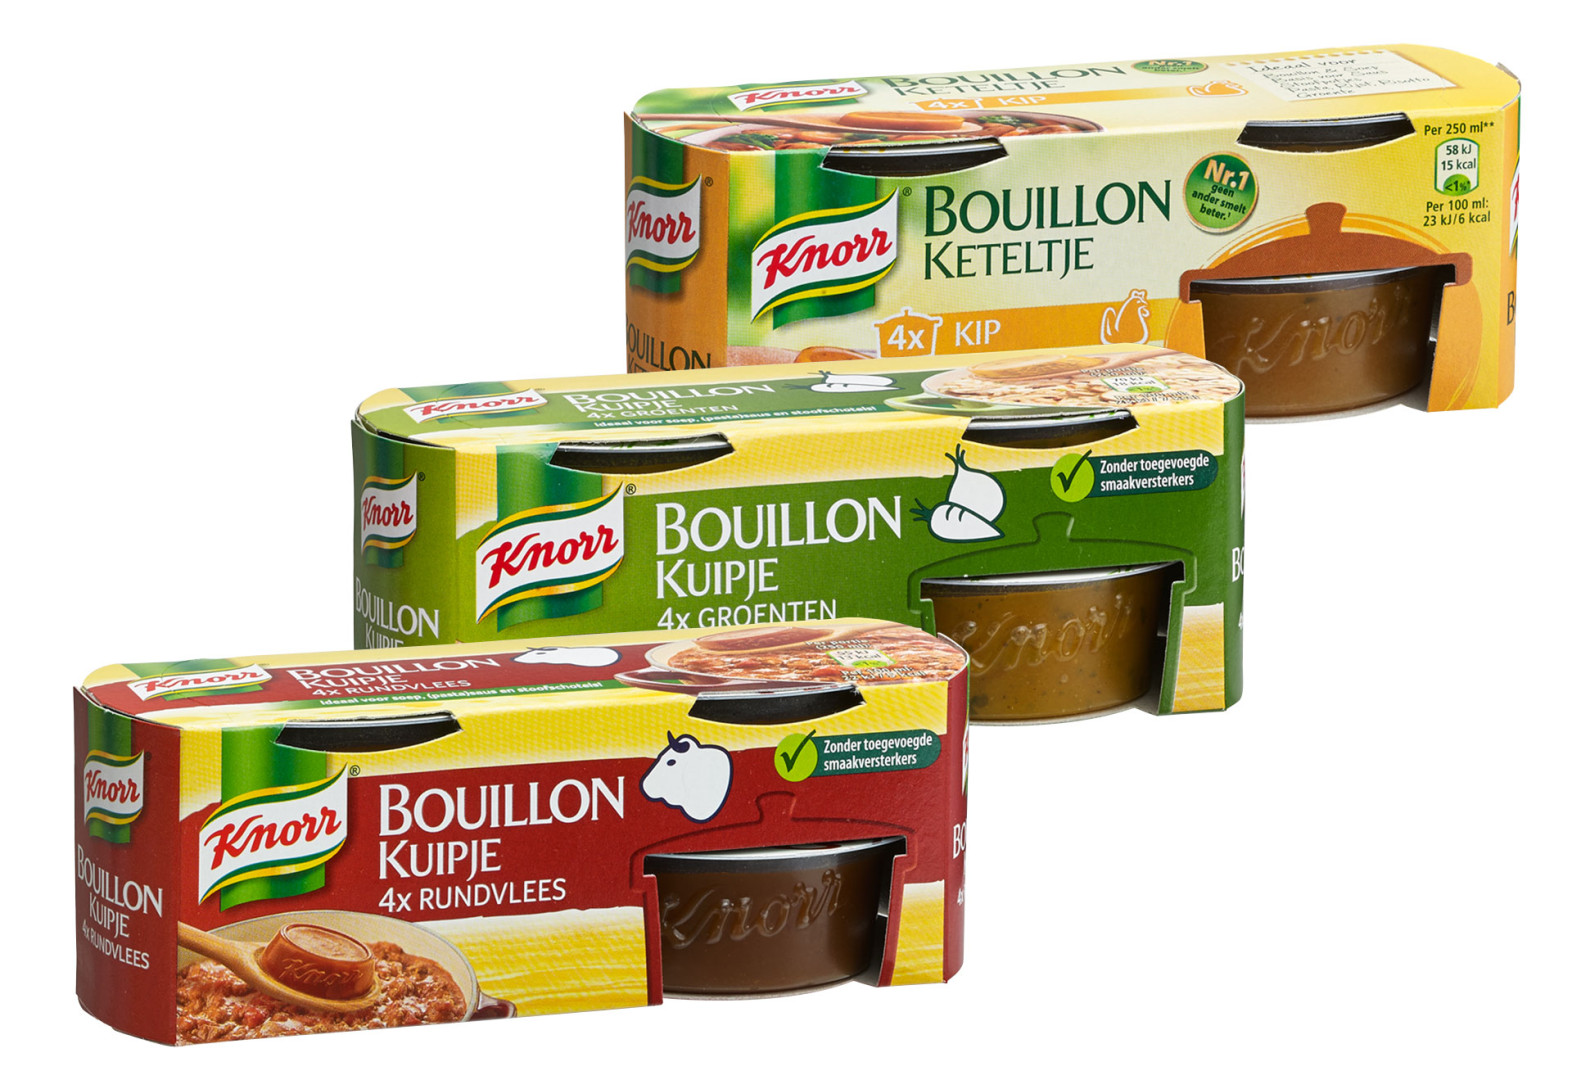 Unilever Knorr bouillonkuipje